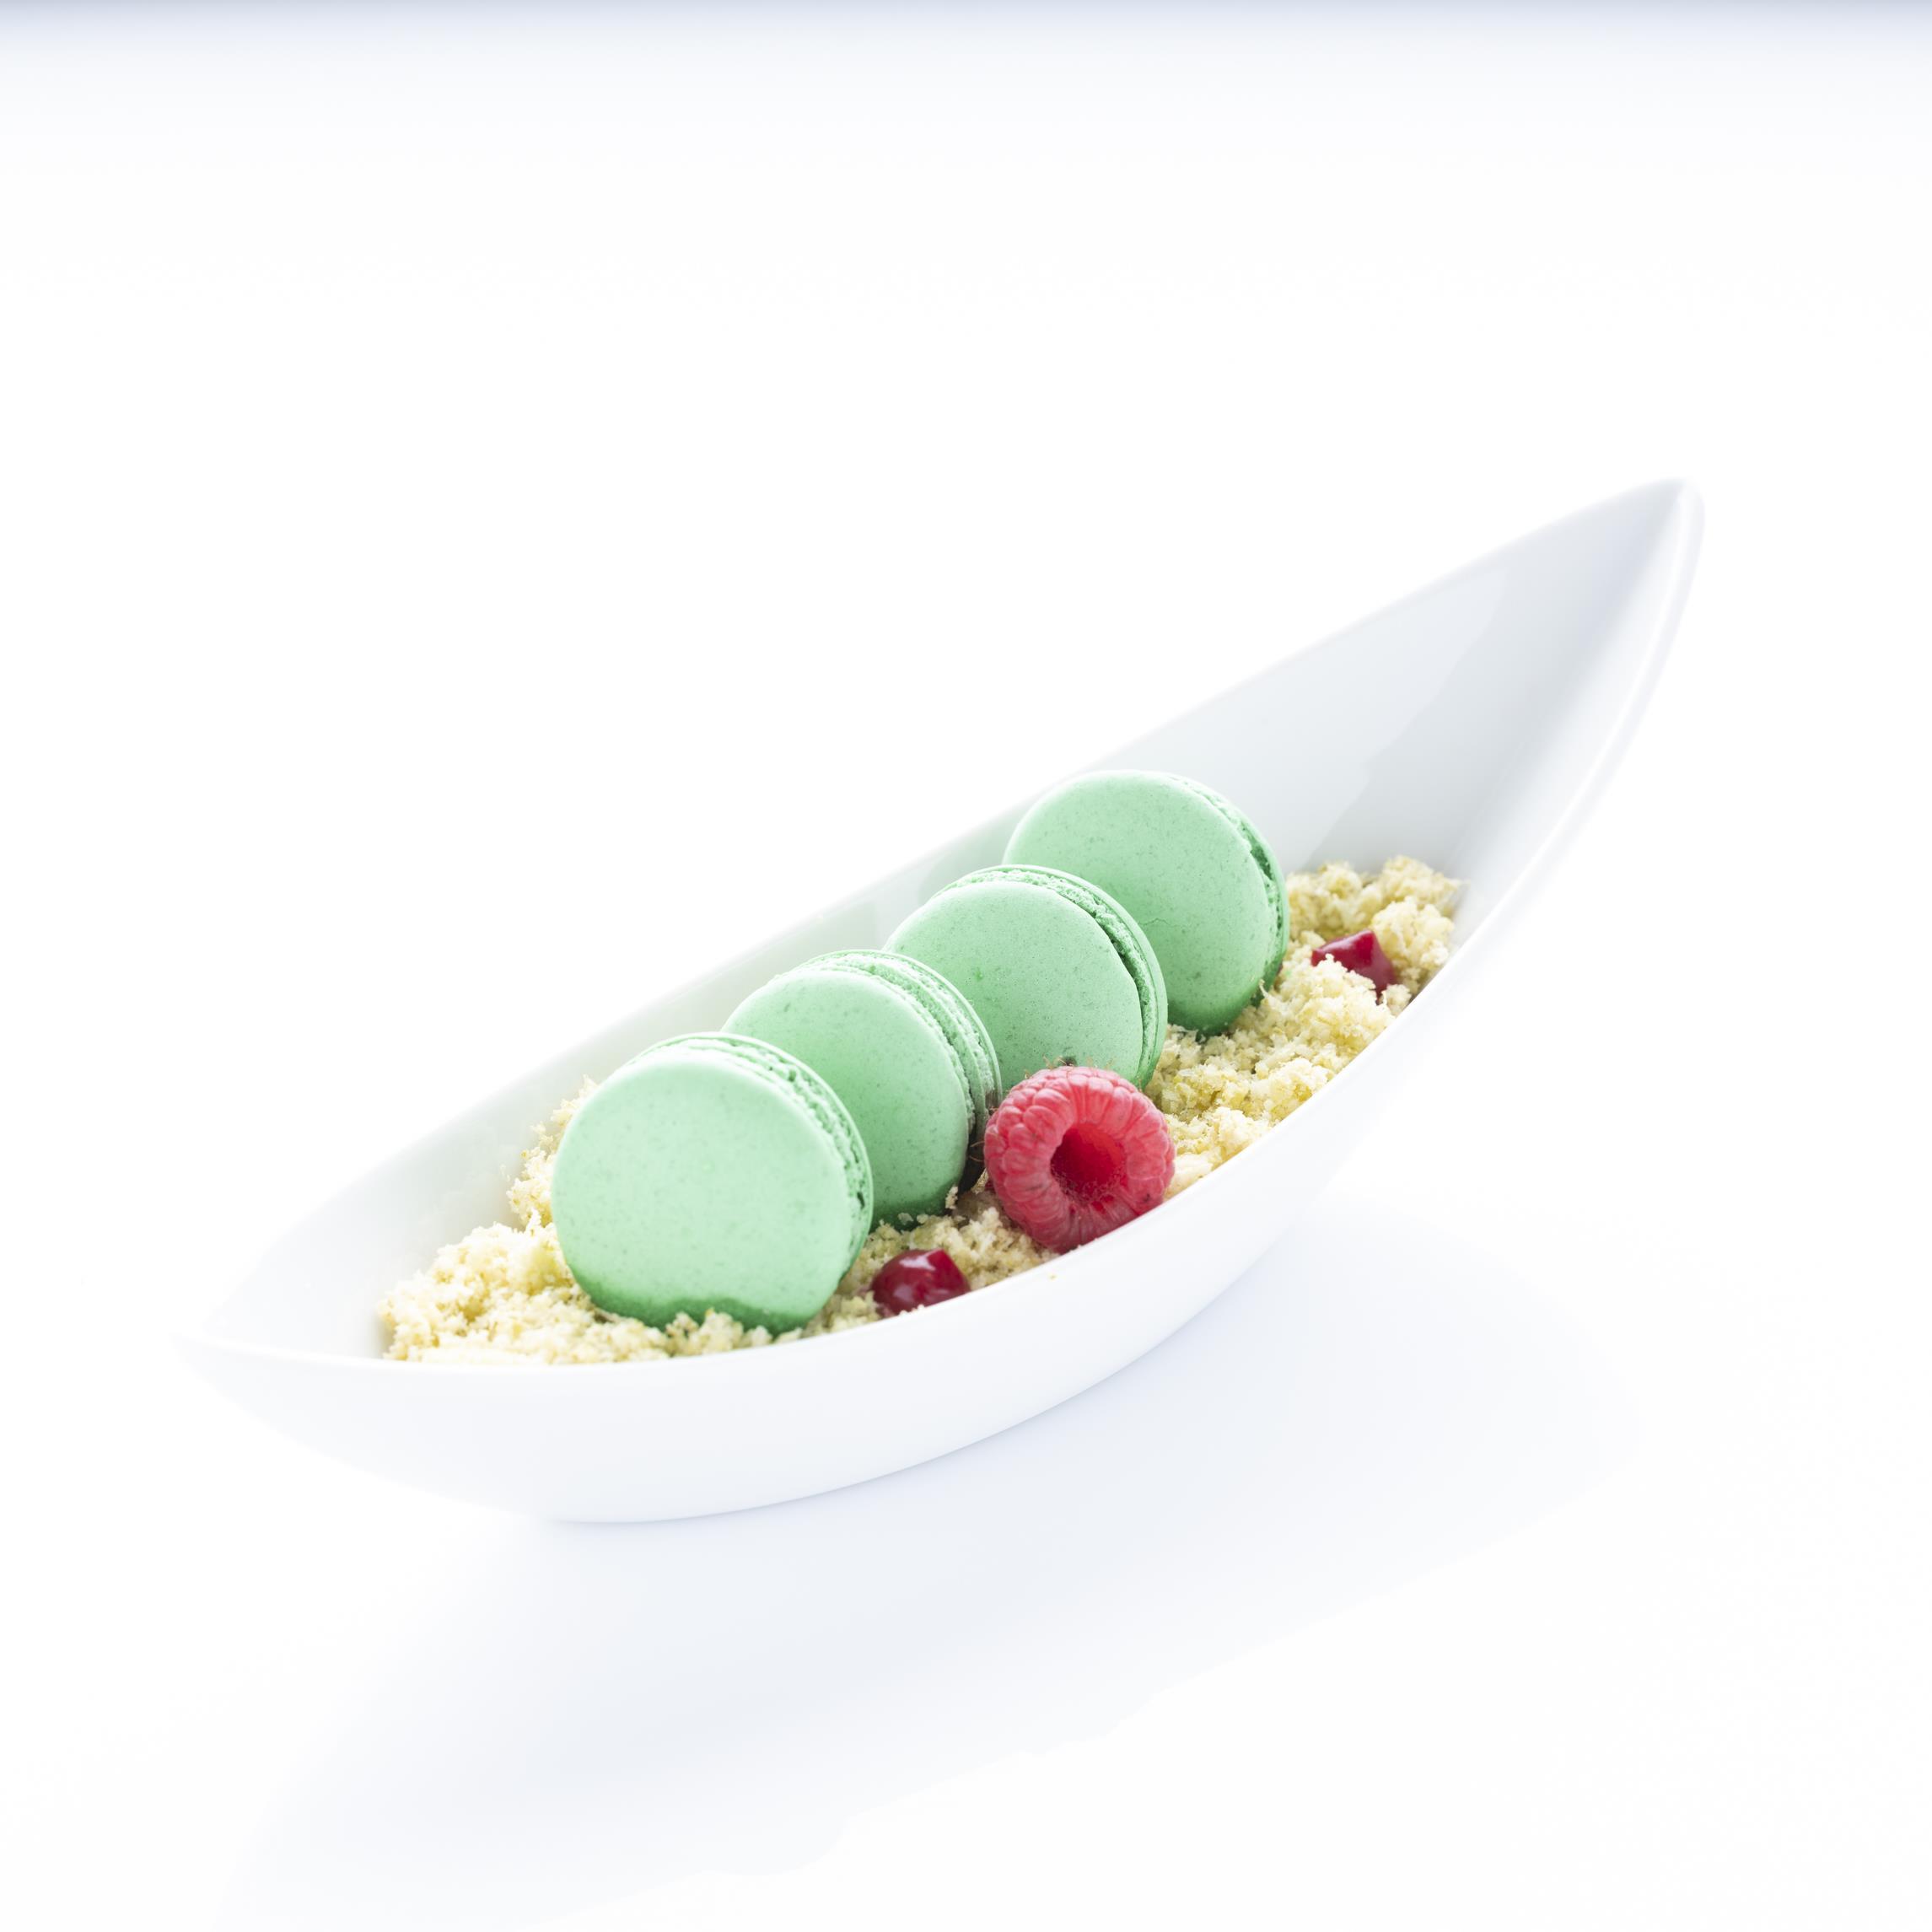 Vegan Lime Raspberry Macarons